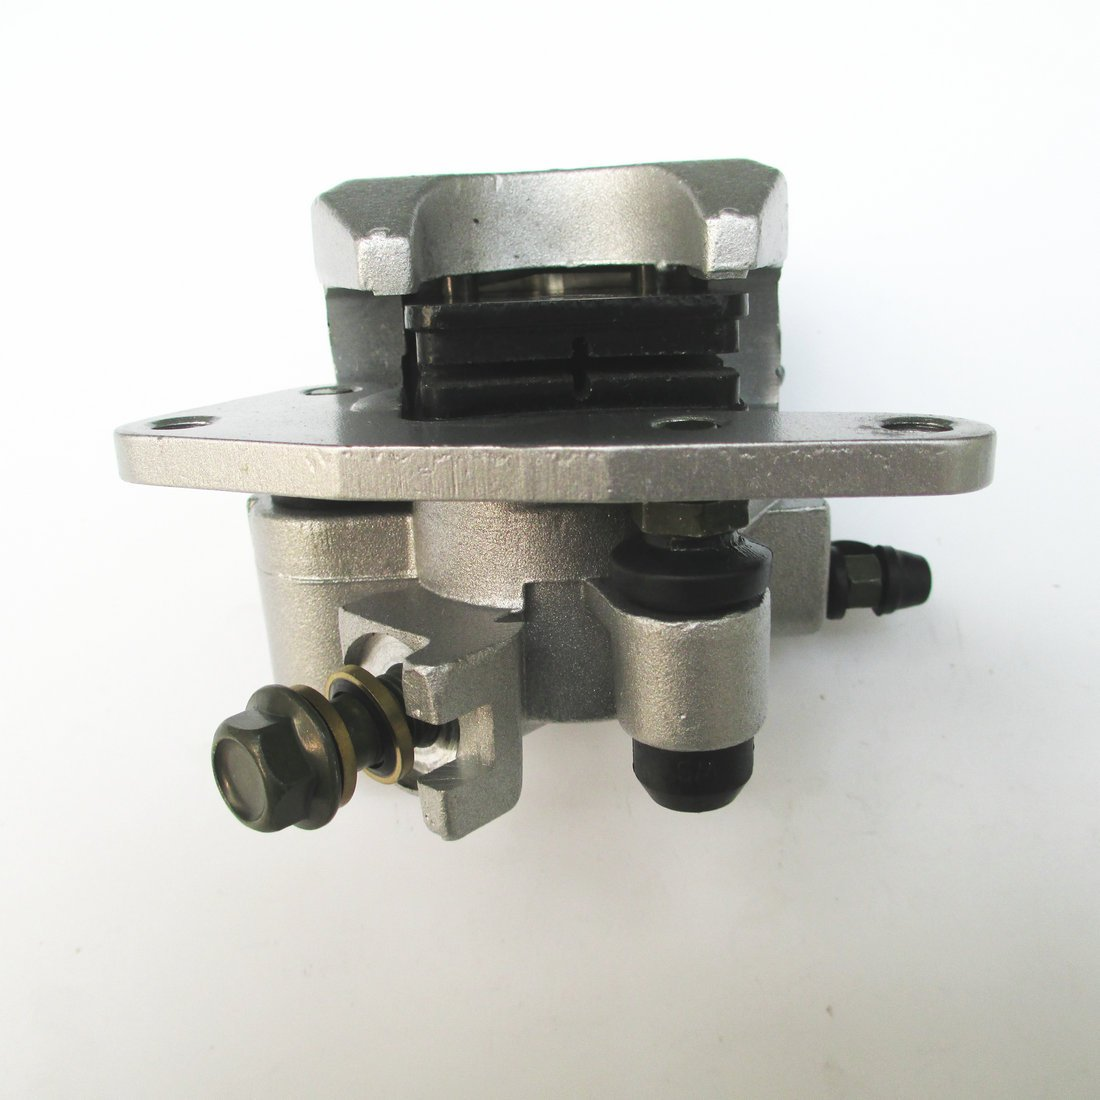 WADS1000288 New Front Brake Caliper Set for SUZUKI VINSON 500 LTA 500F LT-A500F 2002-2007 NEW by WADS1000288 (Image #6)